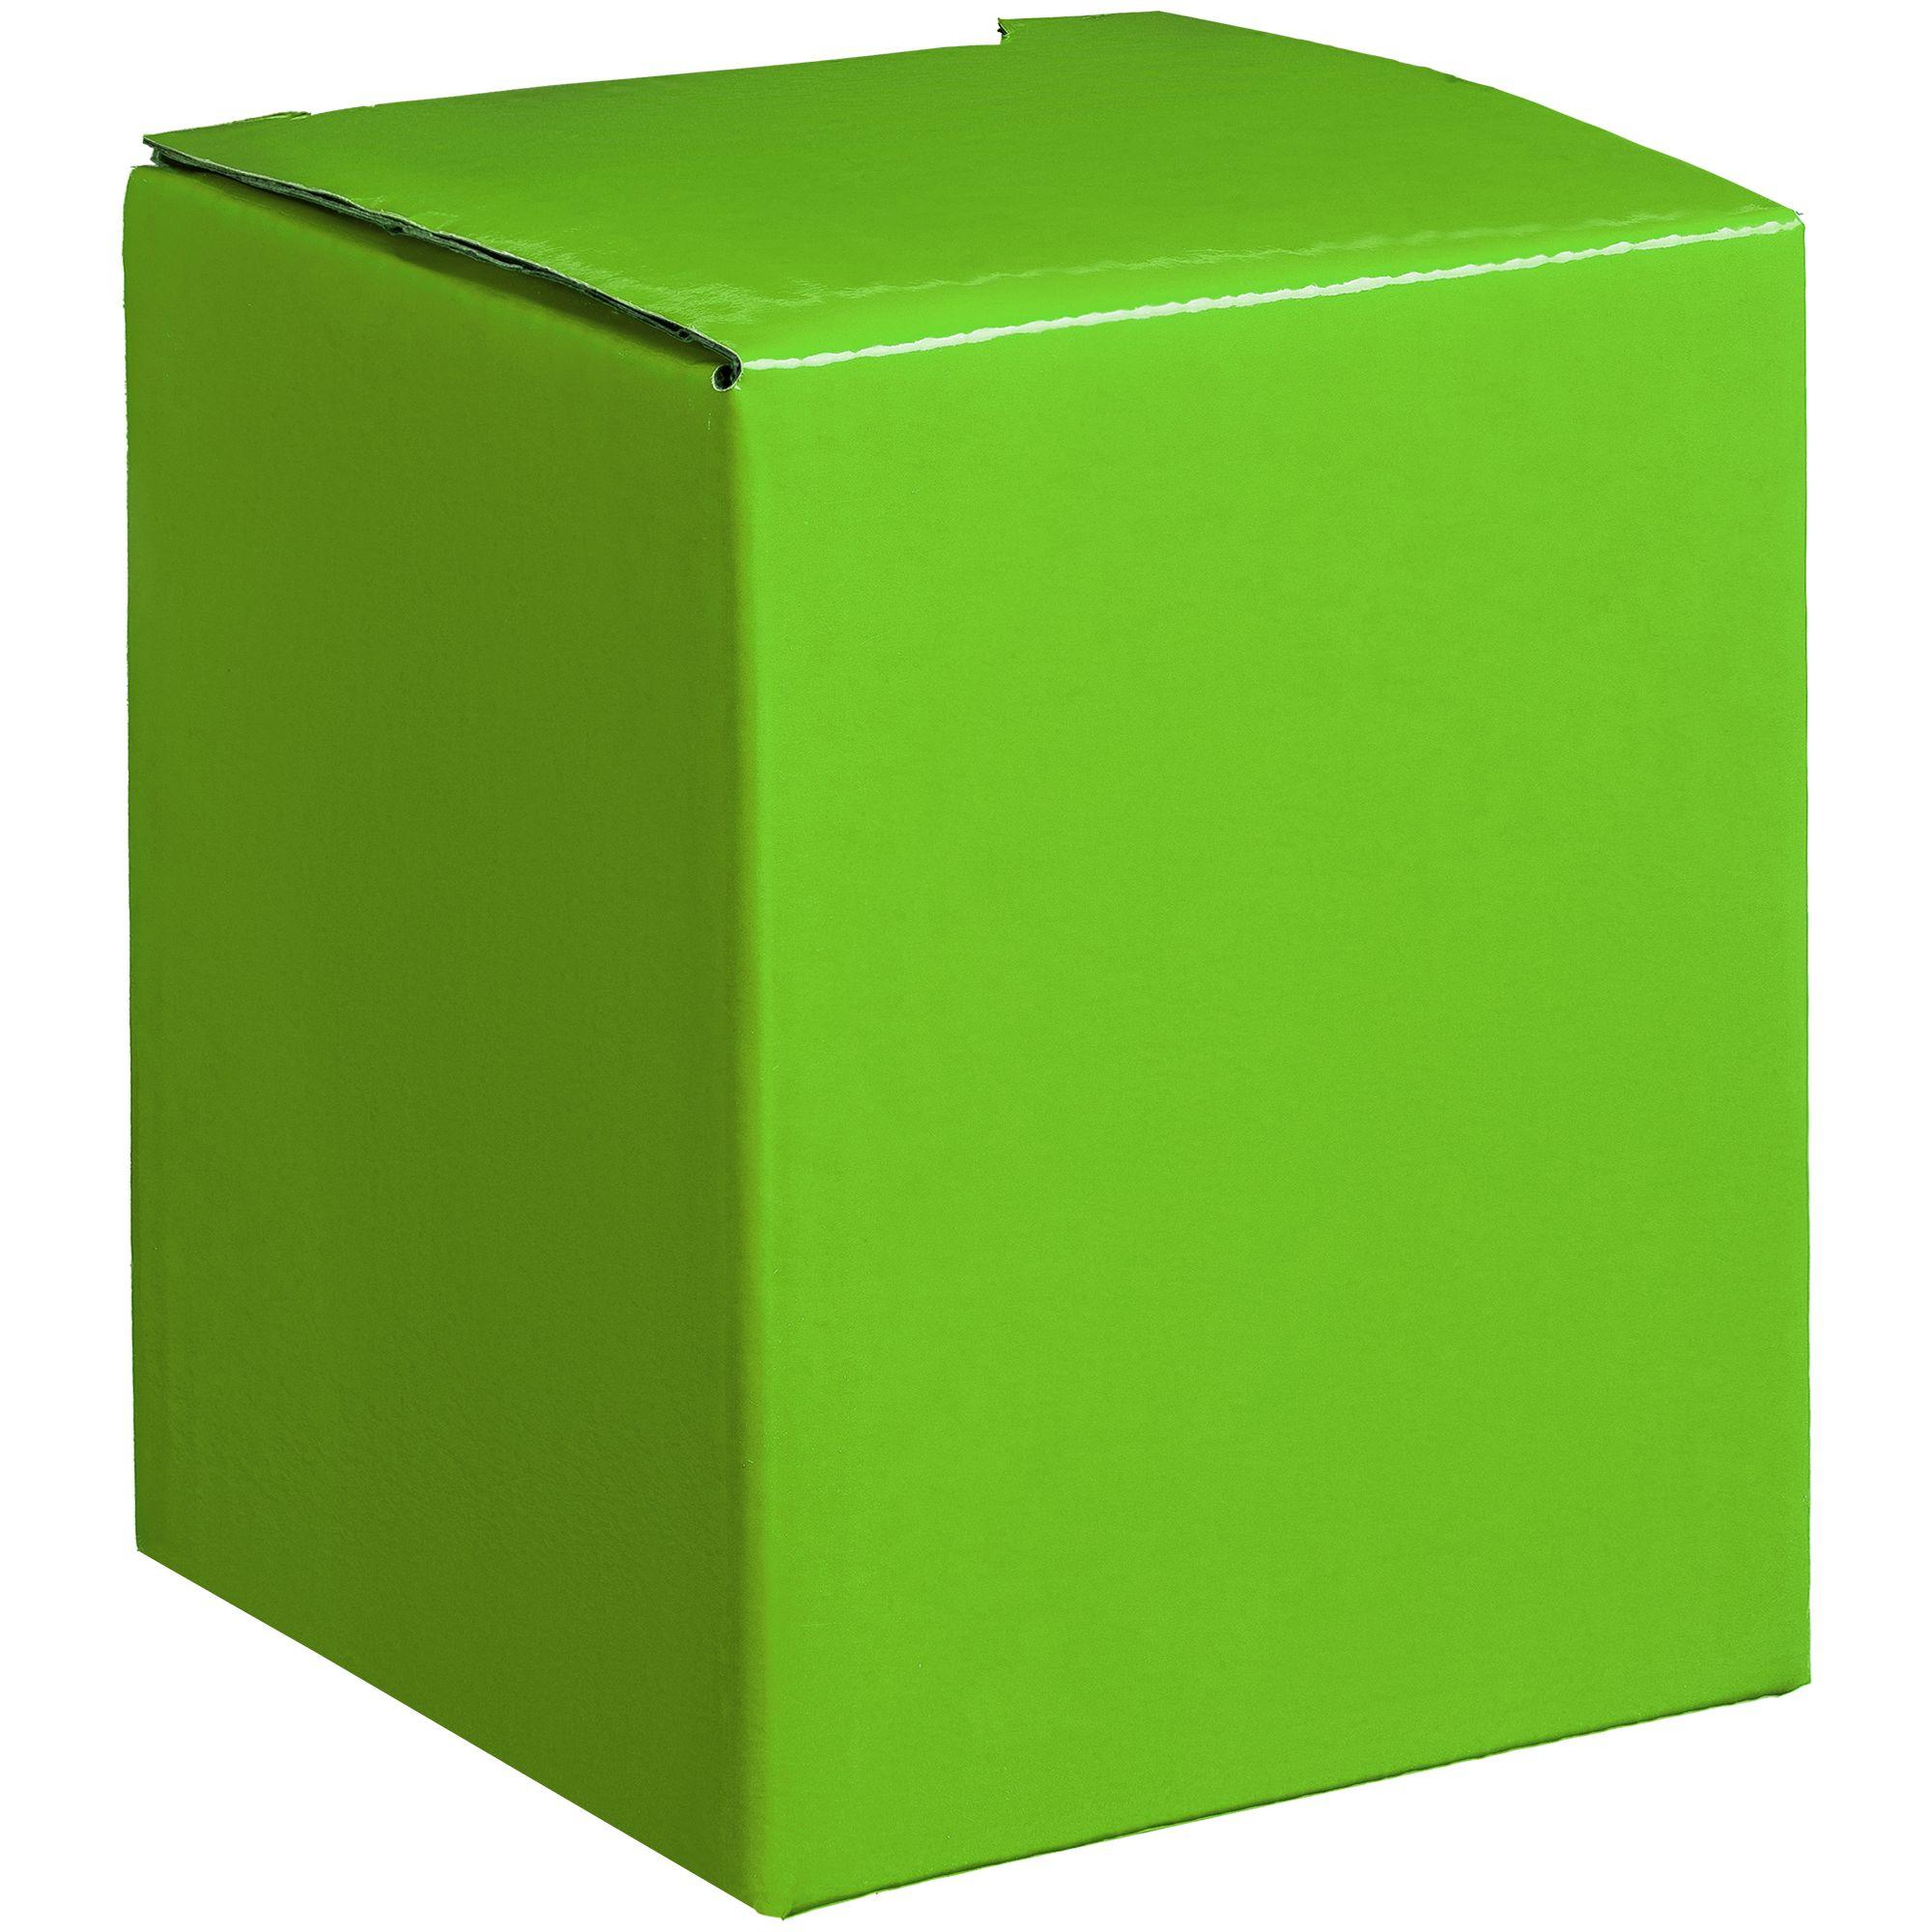 Картинка зеленой коробки